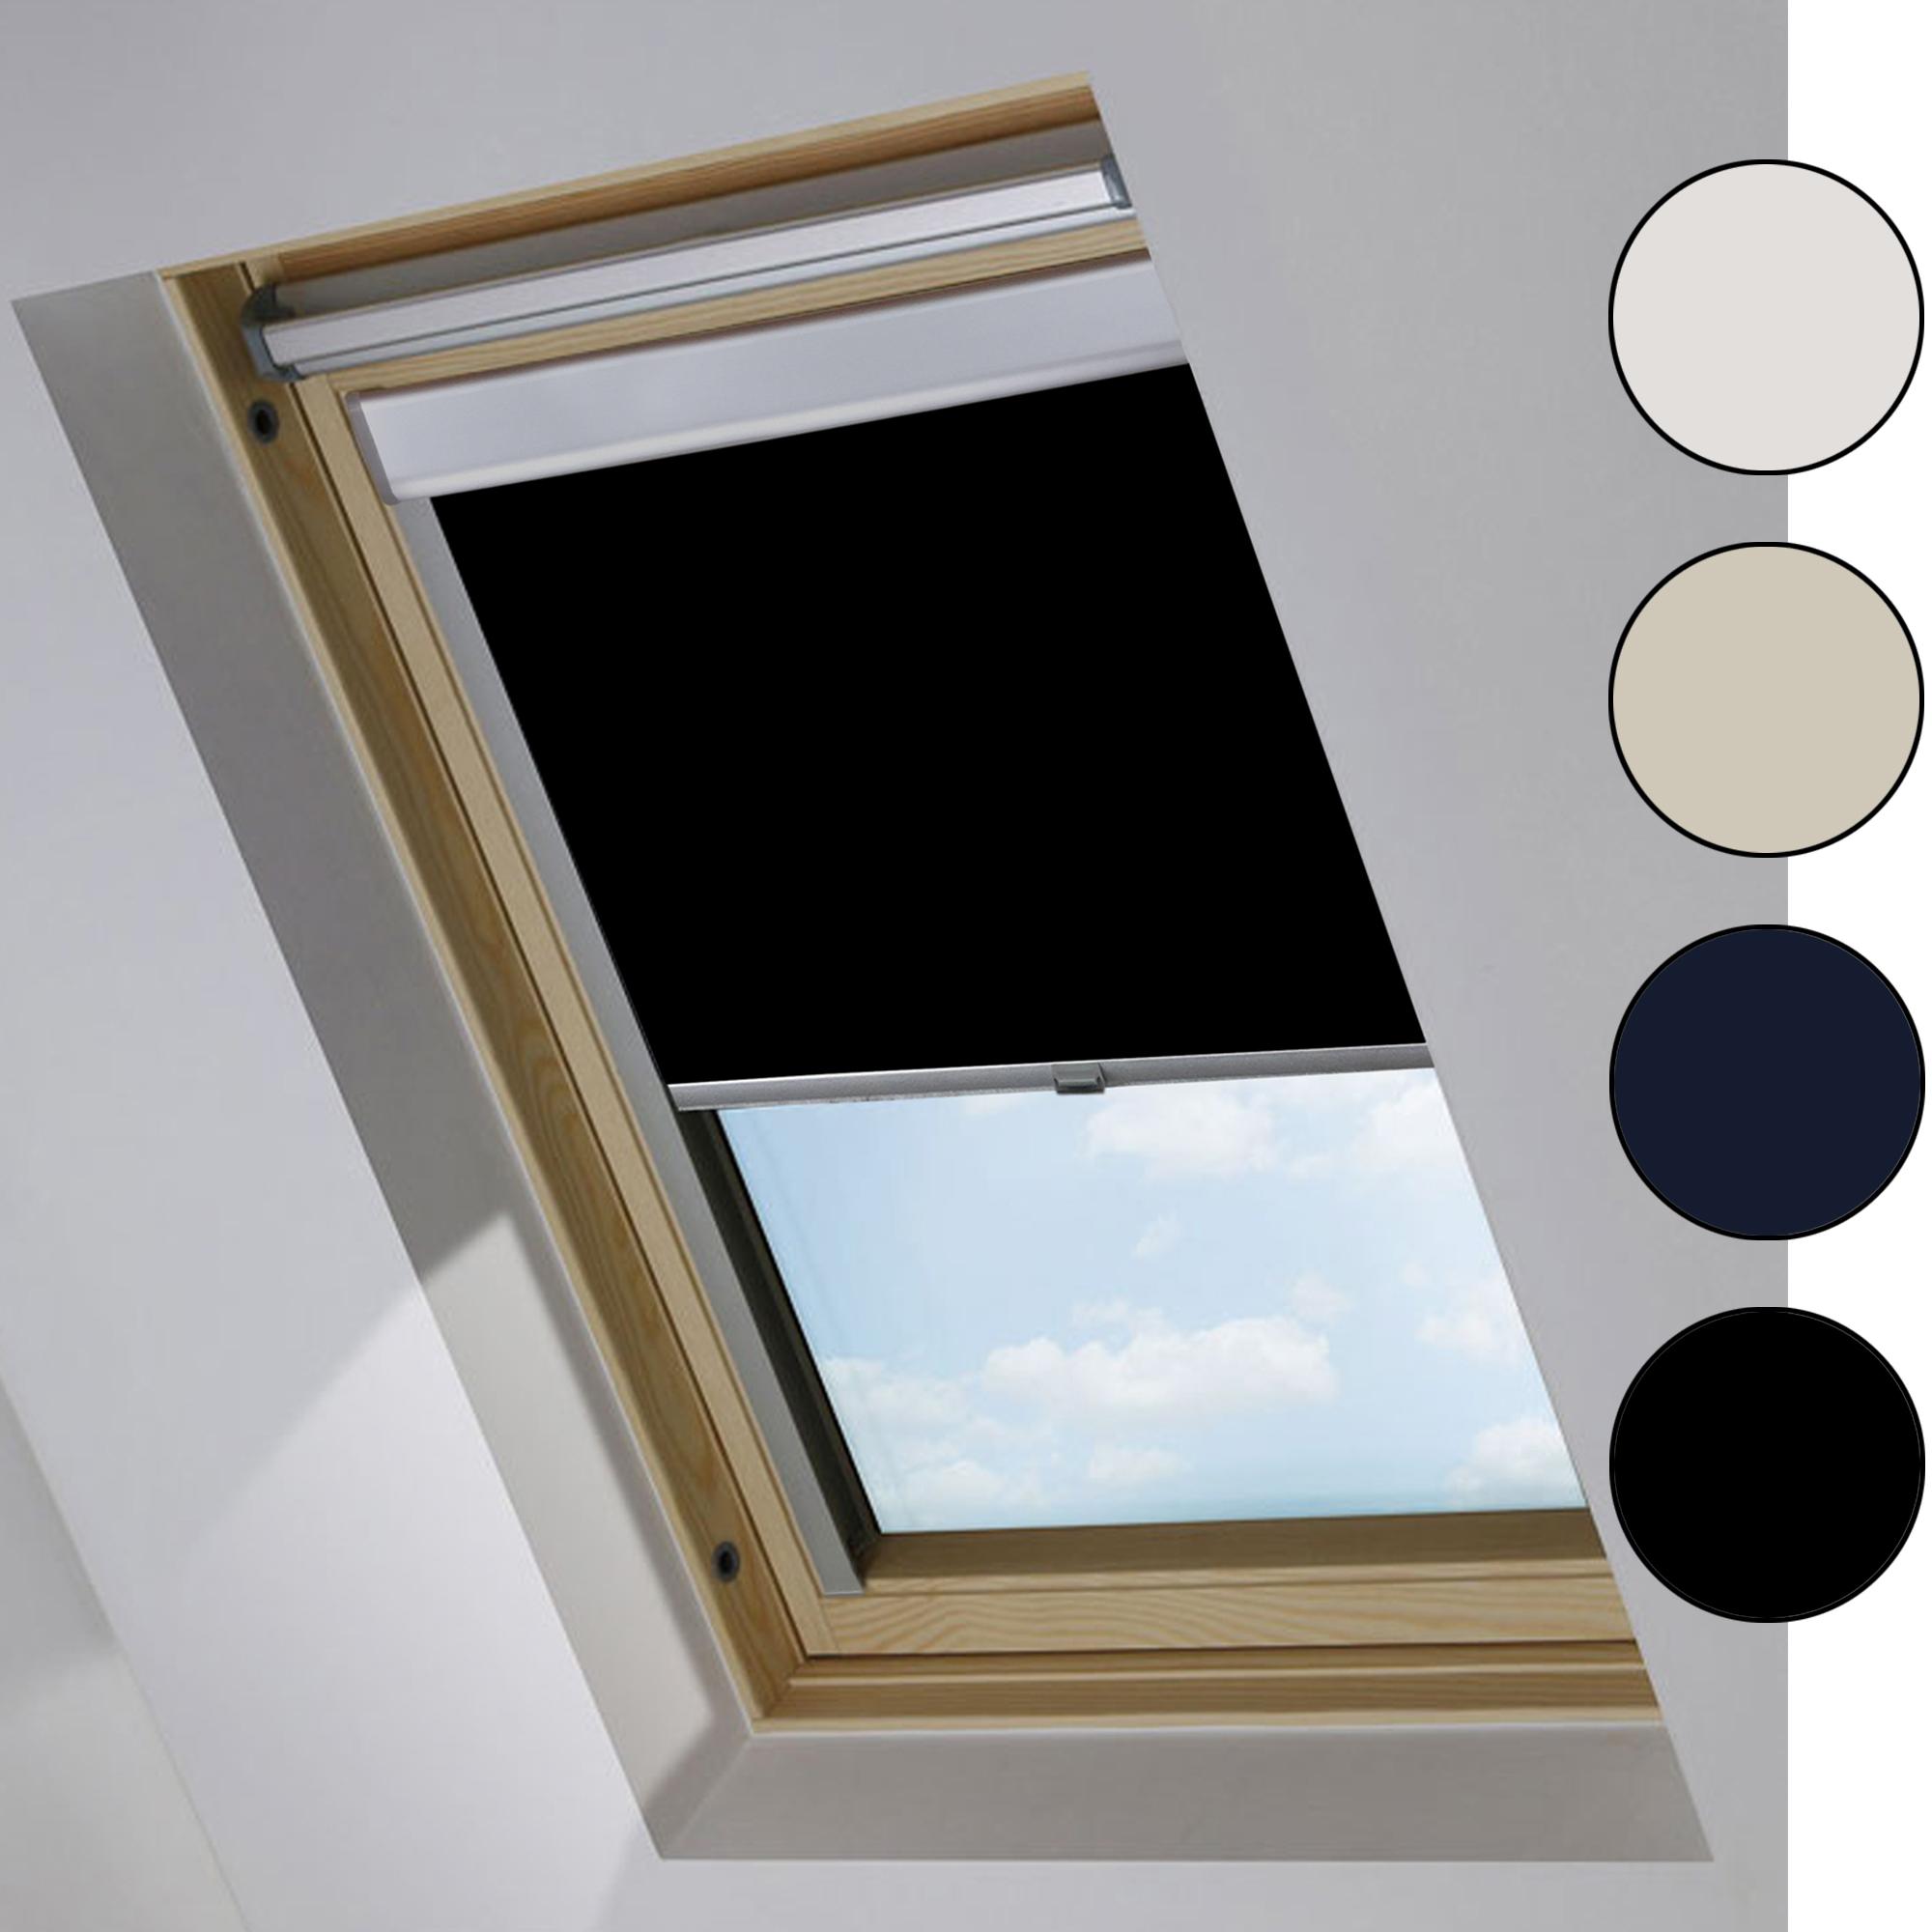 Verdunkelungsrollo passend f r velux dachfenster for Verdunkelungsrollo fur dachfenster